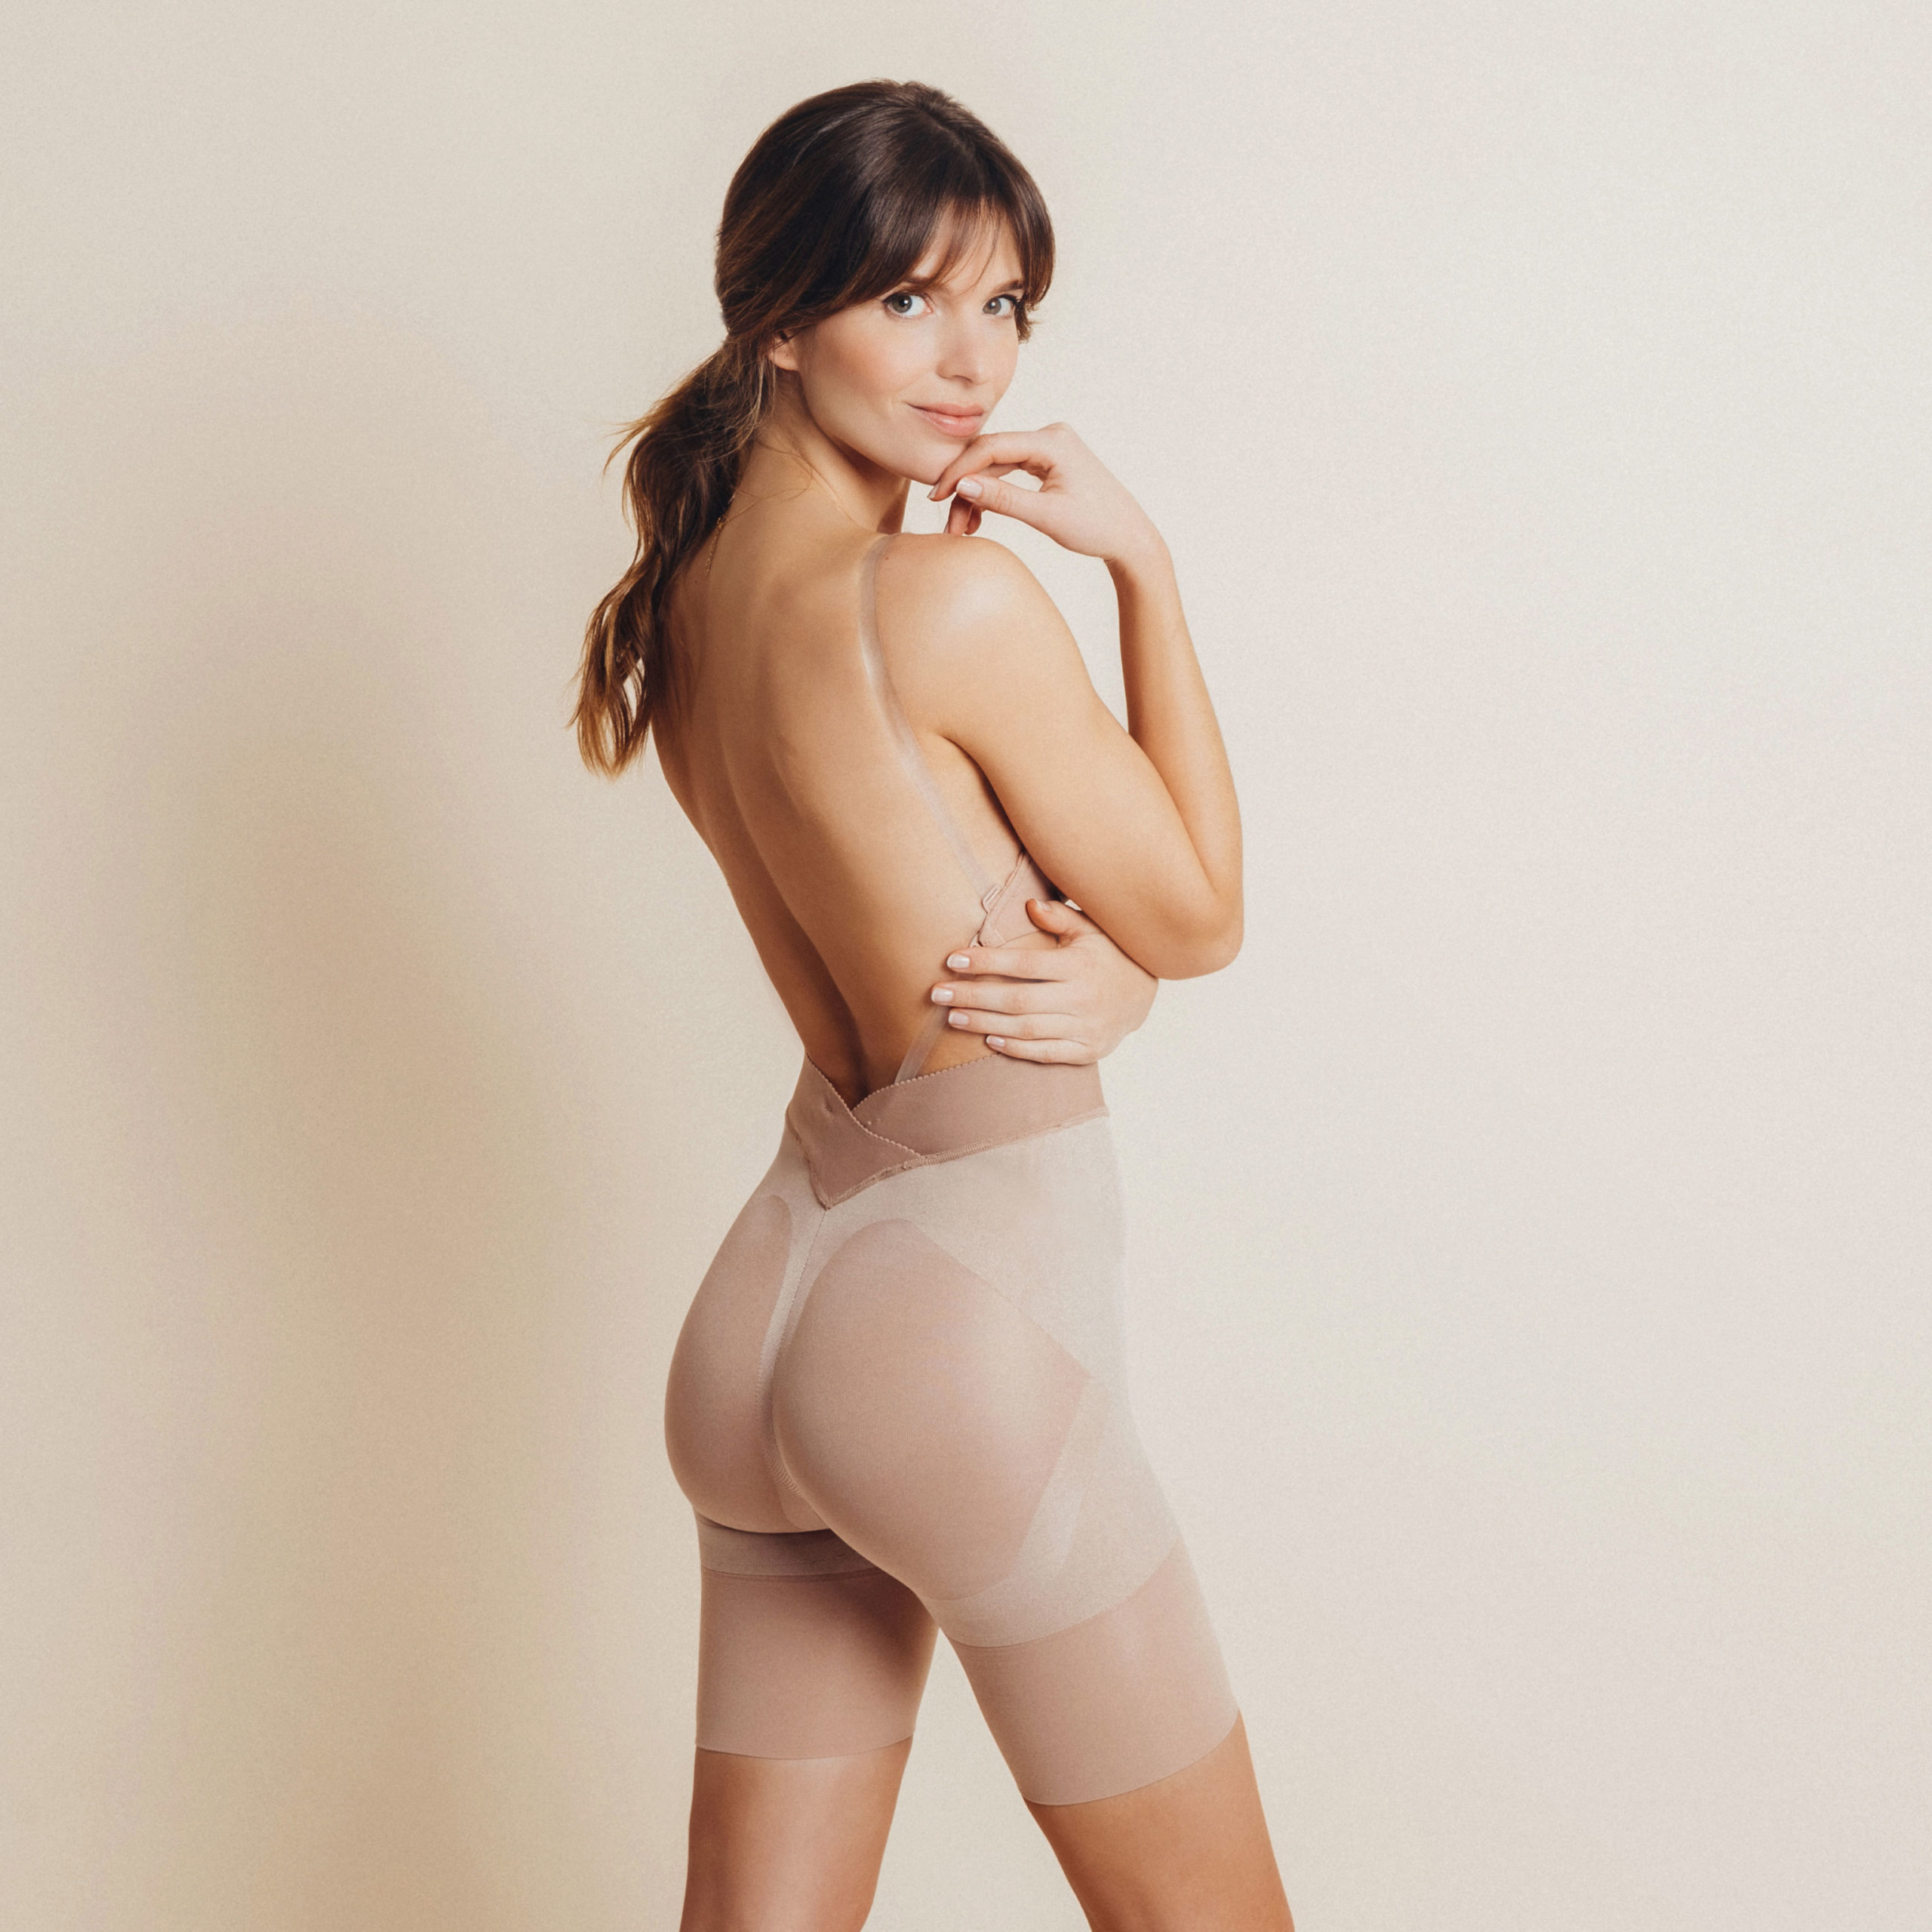 gaine ventre plat soutien gorge dos nu lingerie invisible mariage Back to Glam Elise Martimort